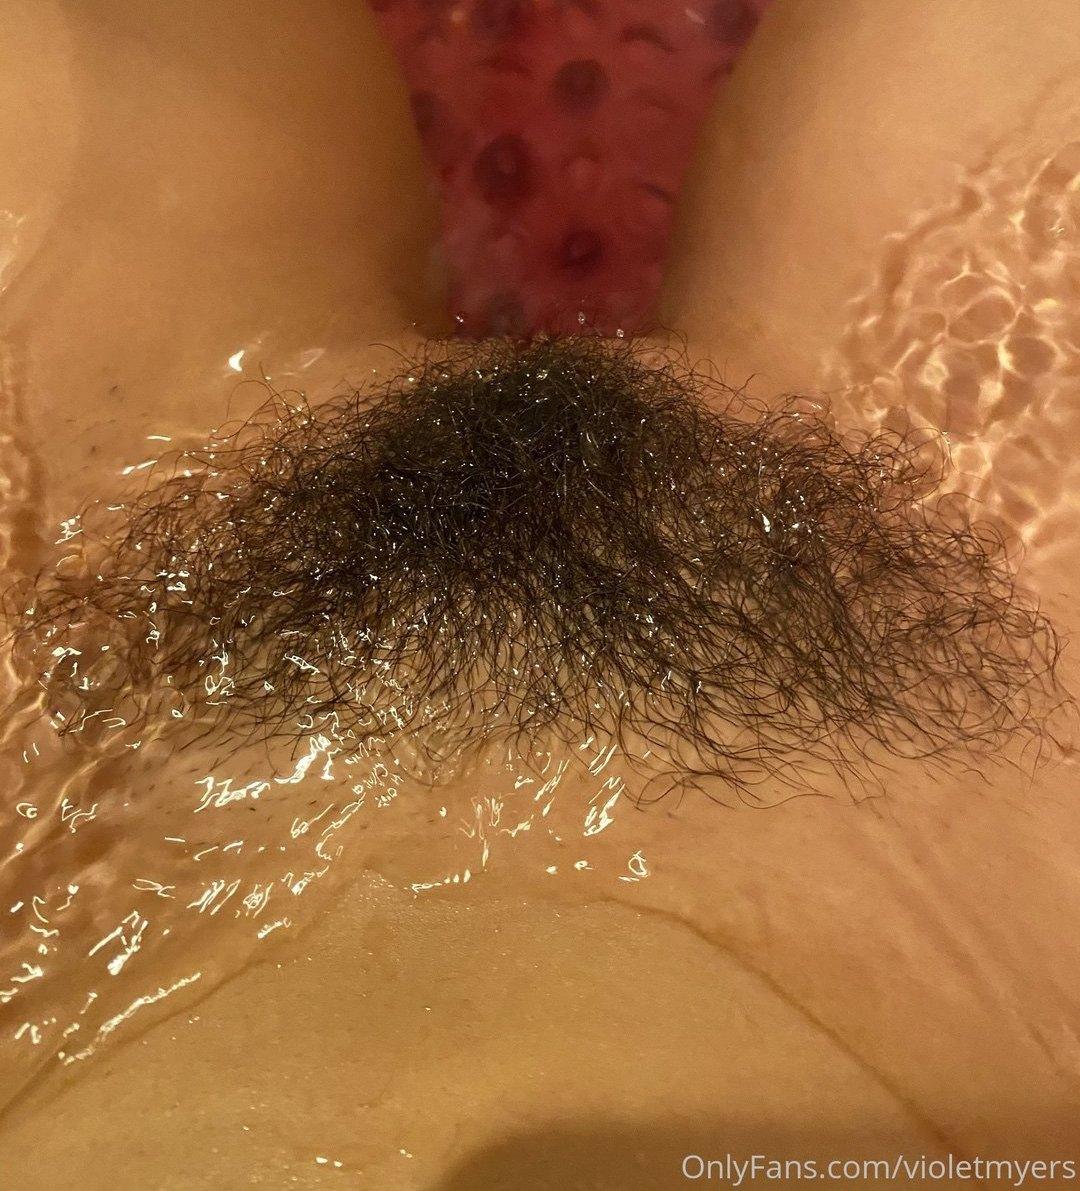 Violet Myers Violetmyers Onlyfans Nudes Leaks 0029